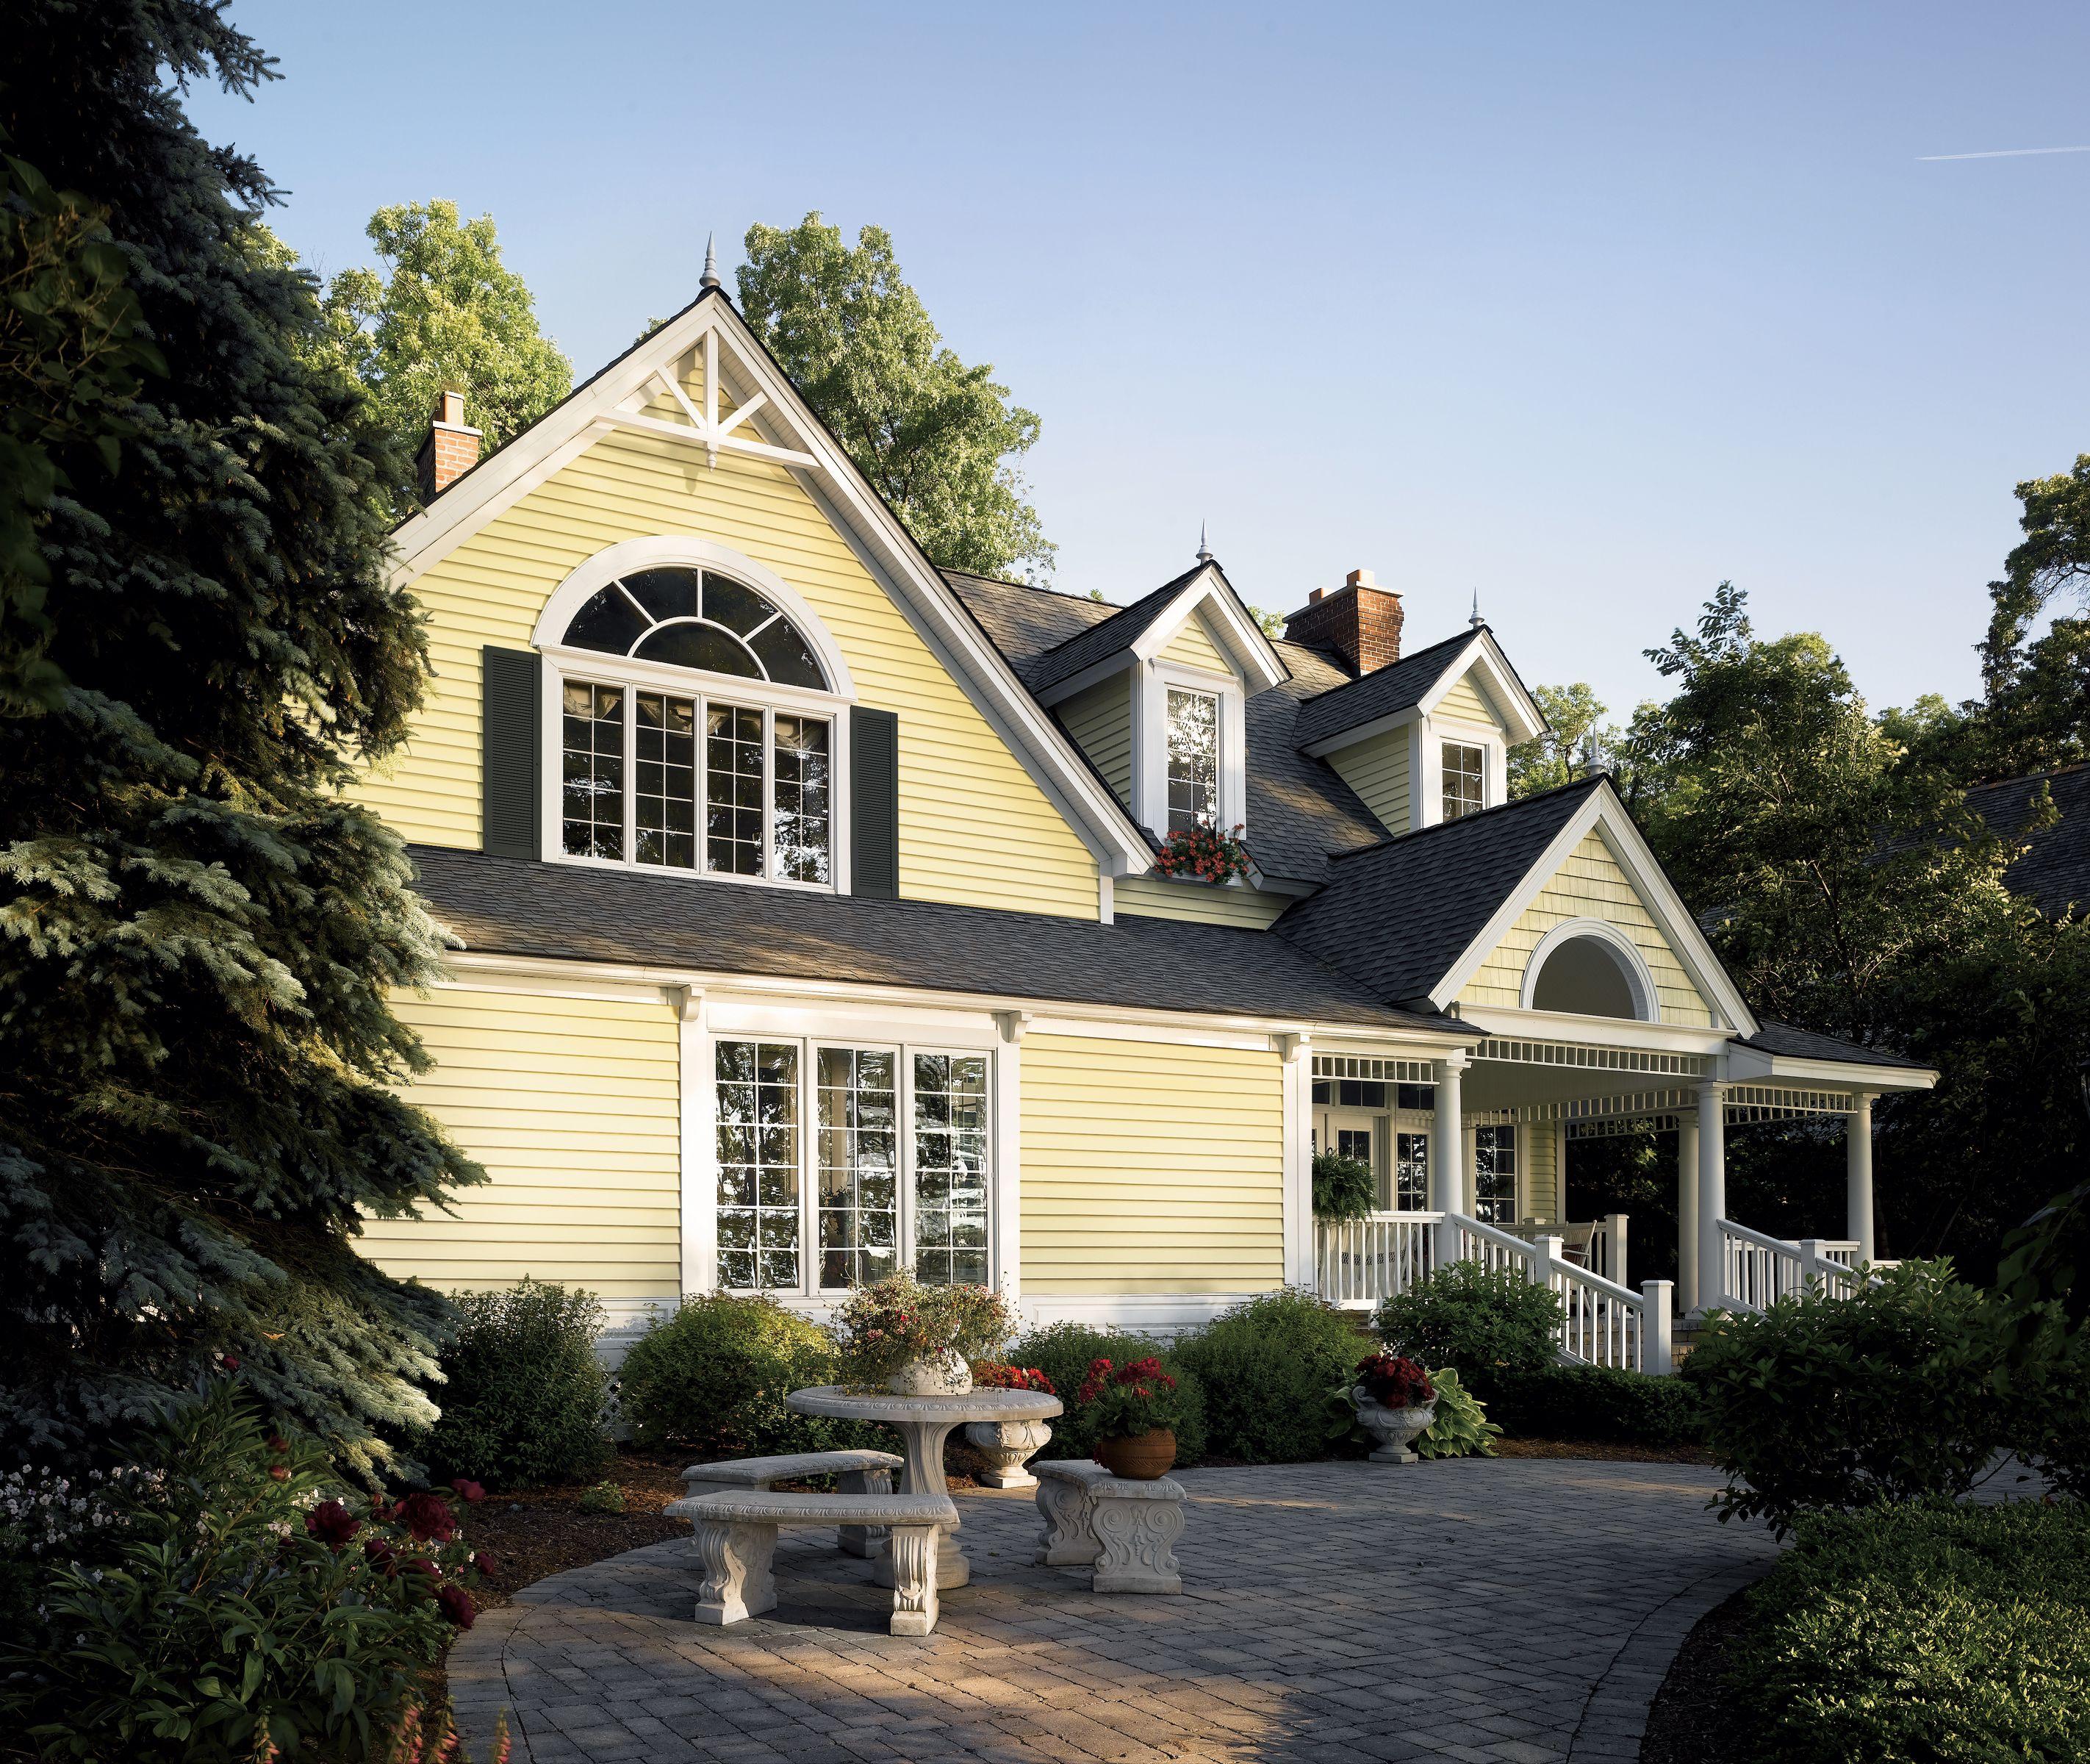 Certainteed Siding Monogram Autumn Yellow Luxury Homes Exterior House Exterior Siding Styles